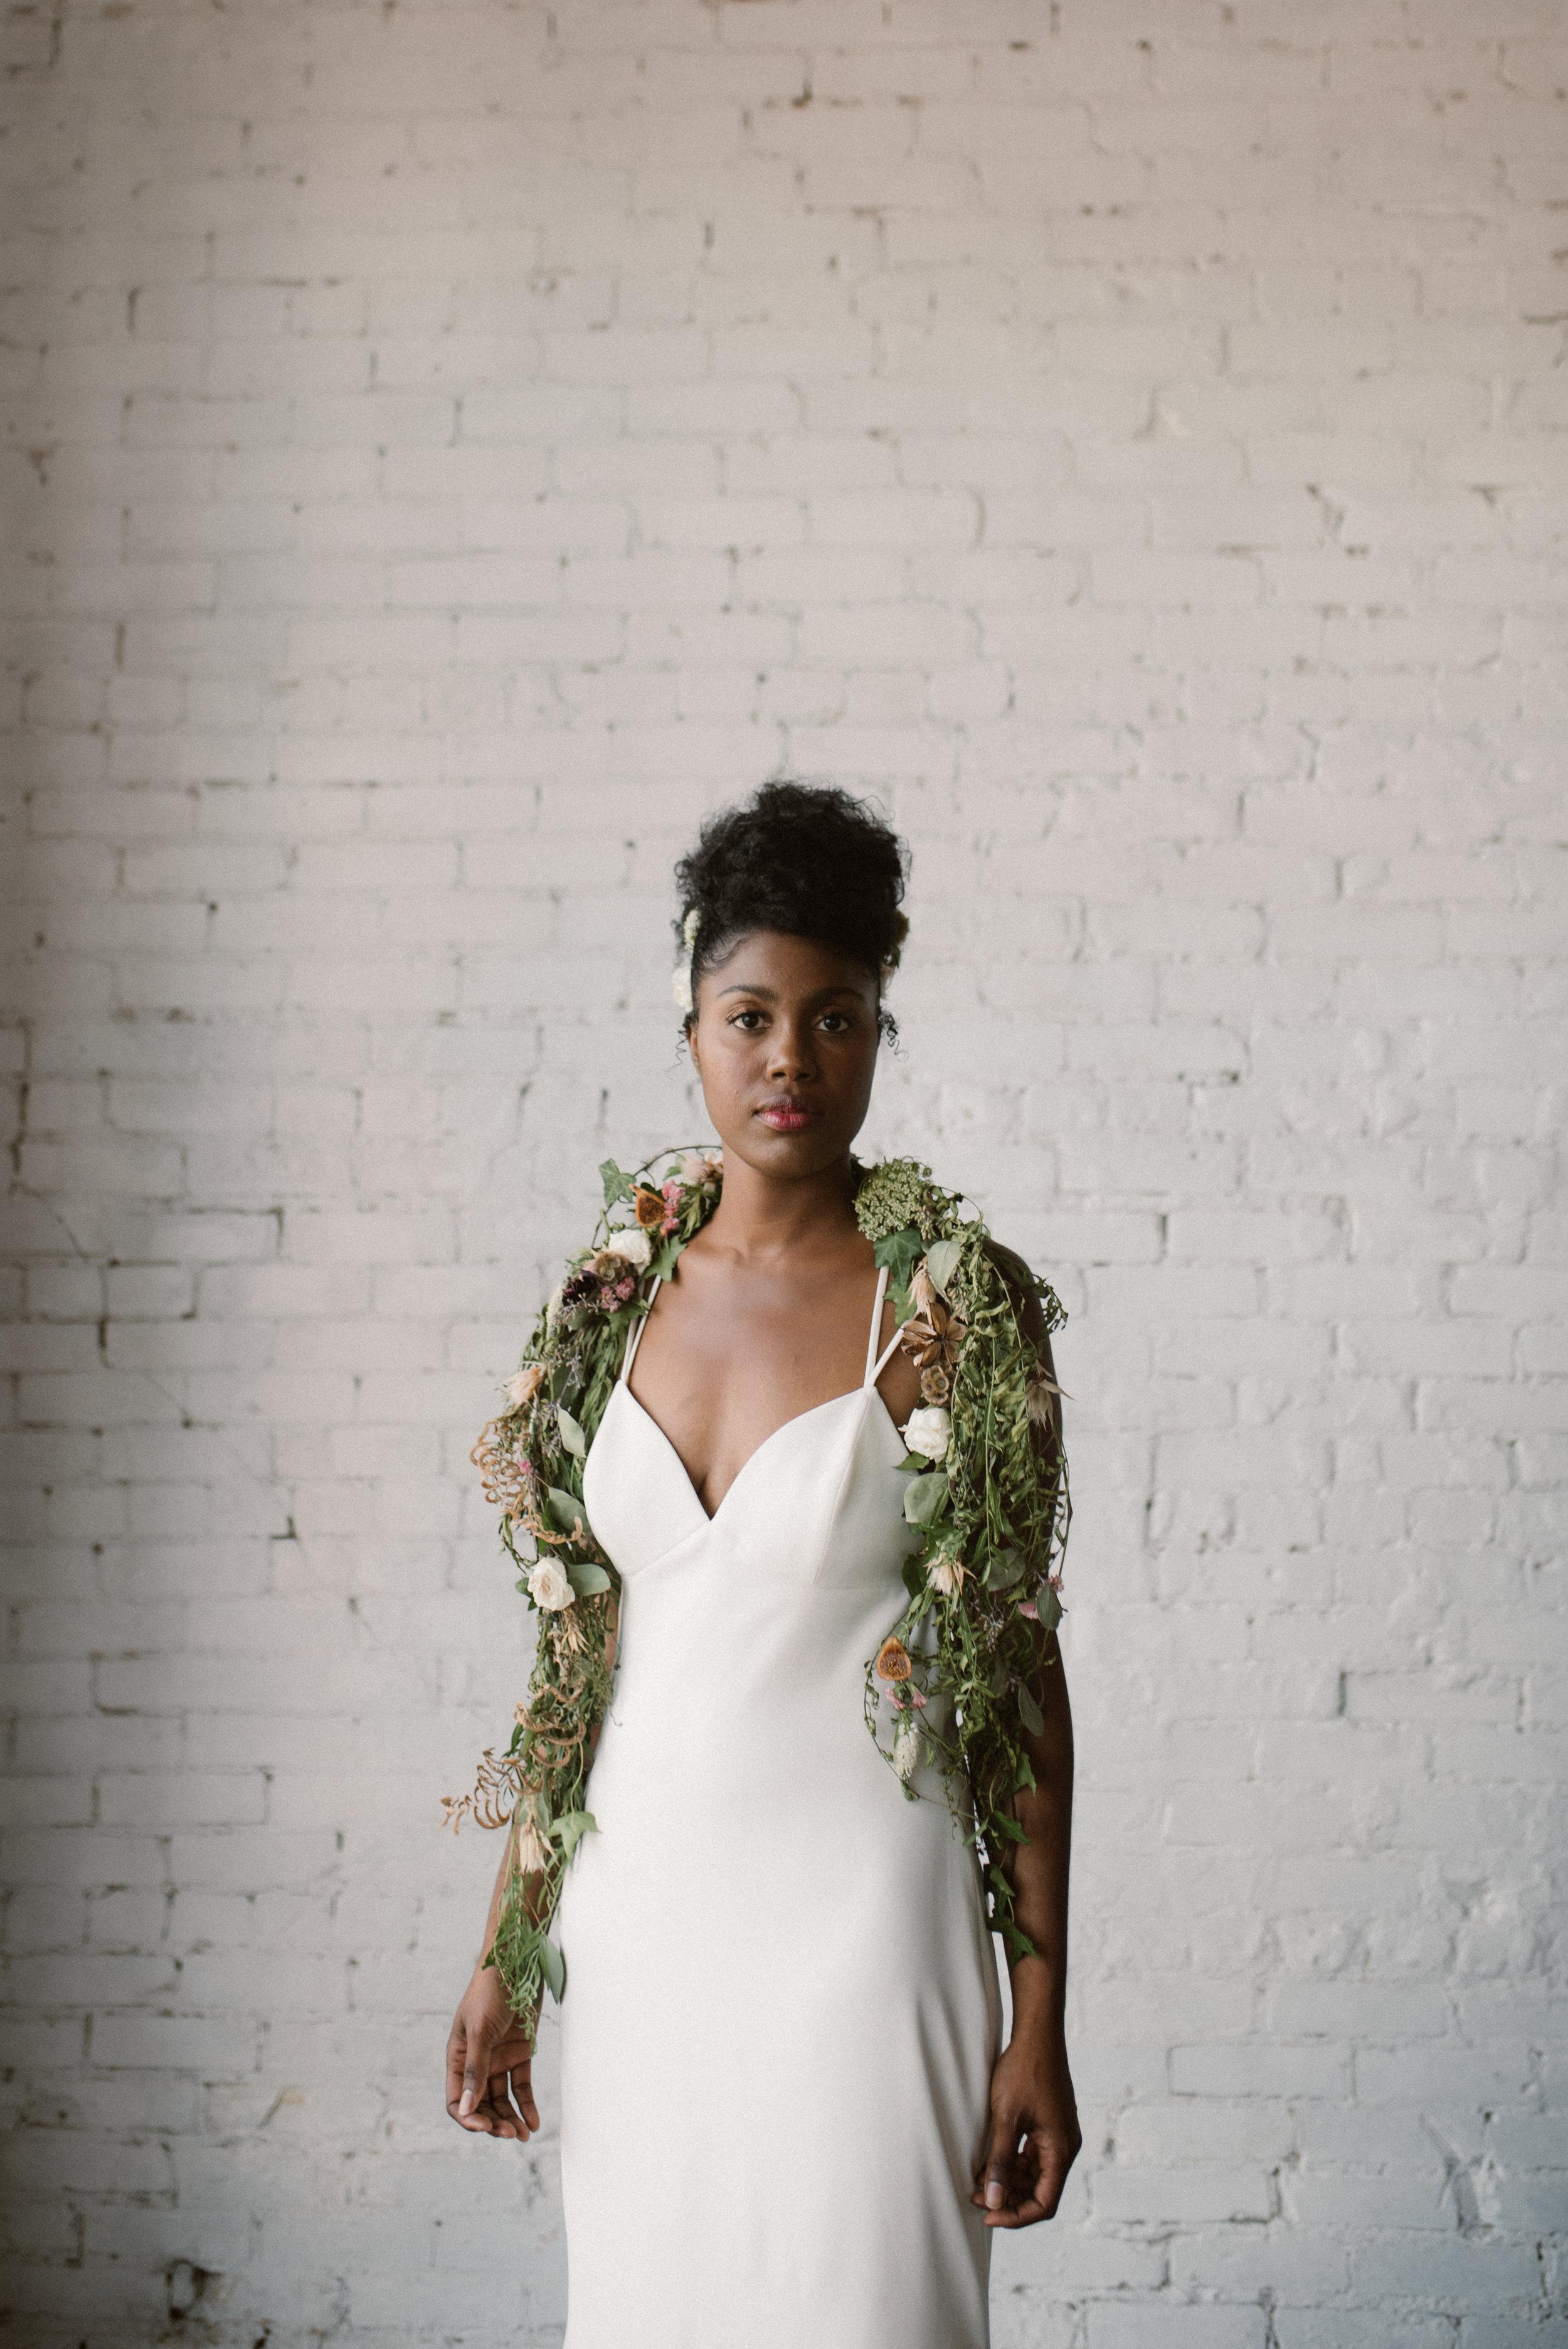 haus-820-minimal-editorial-wedding-styled-shoot-72.jpg